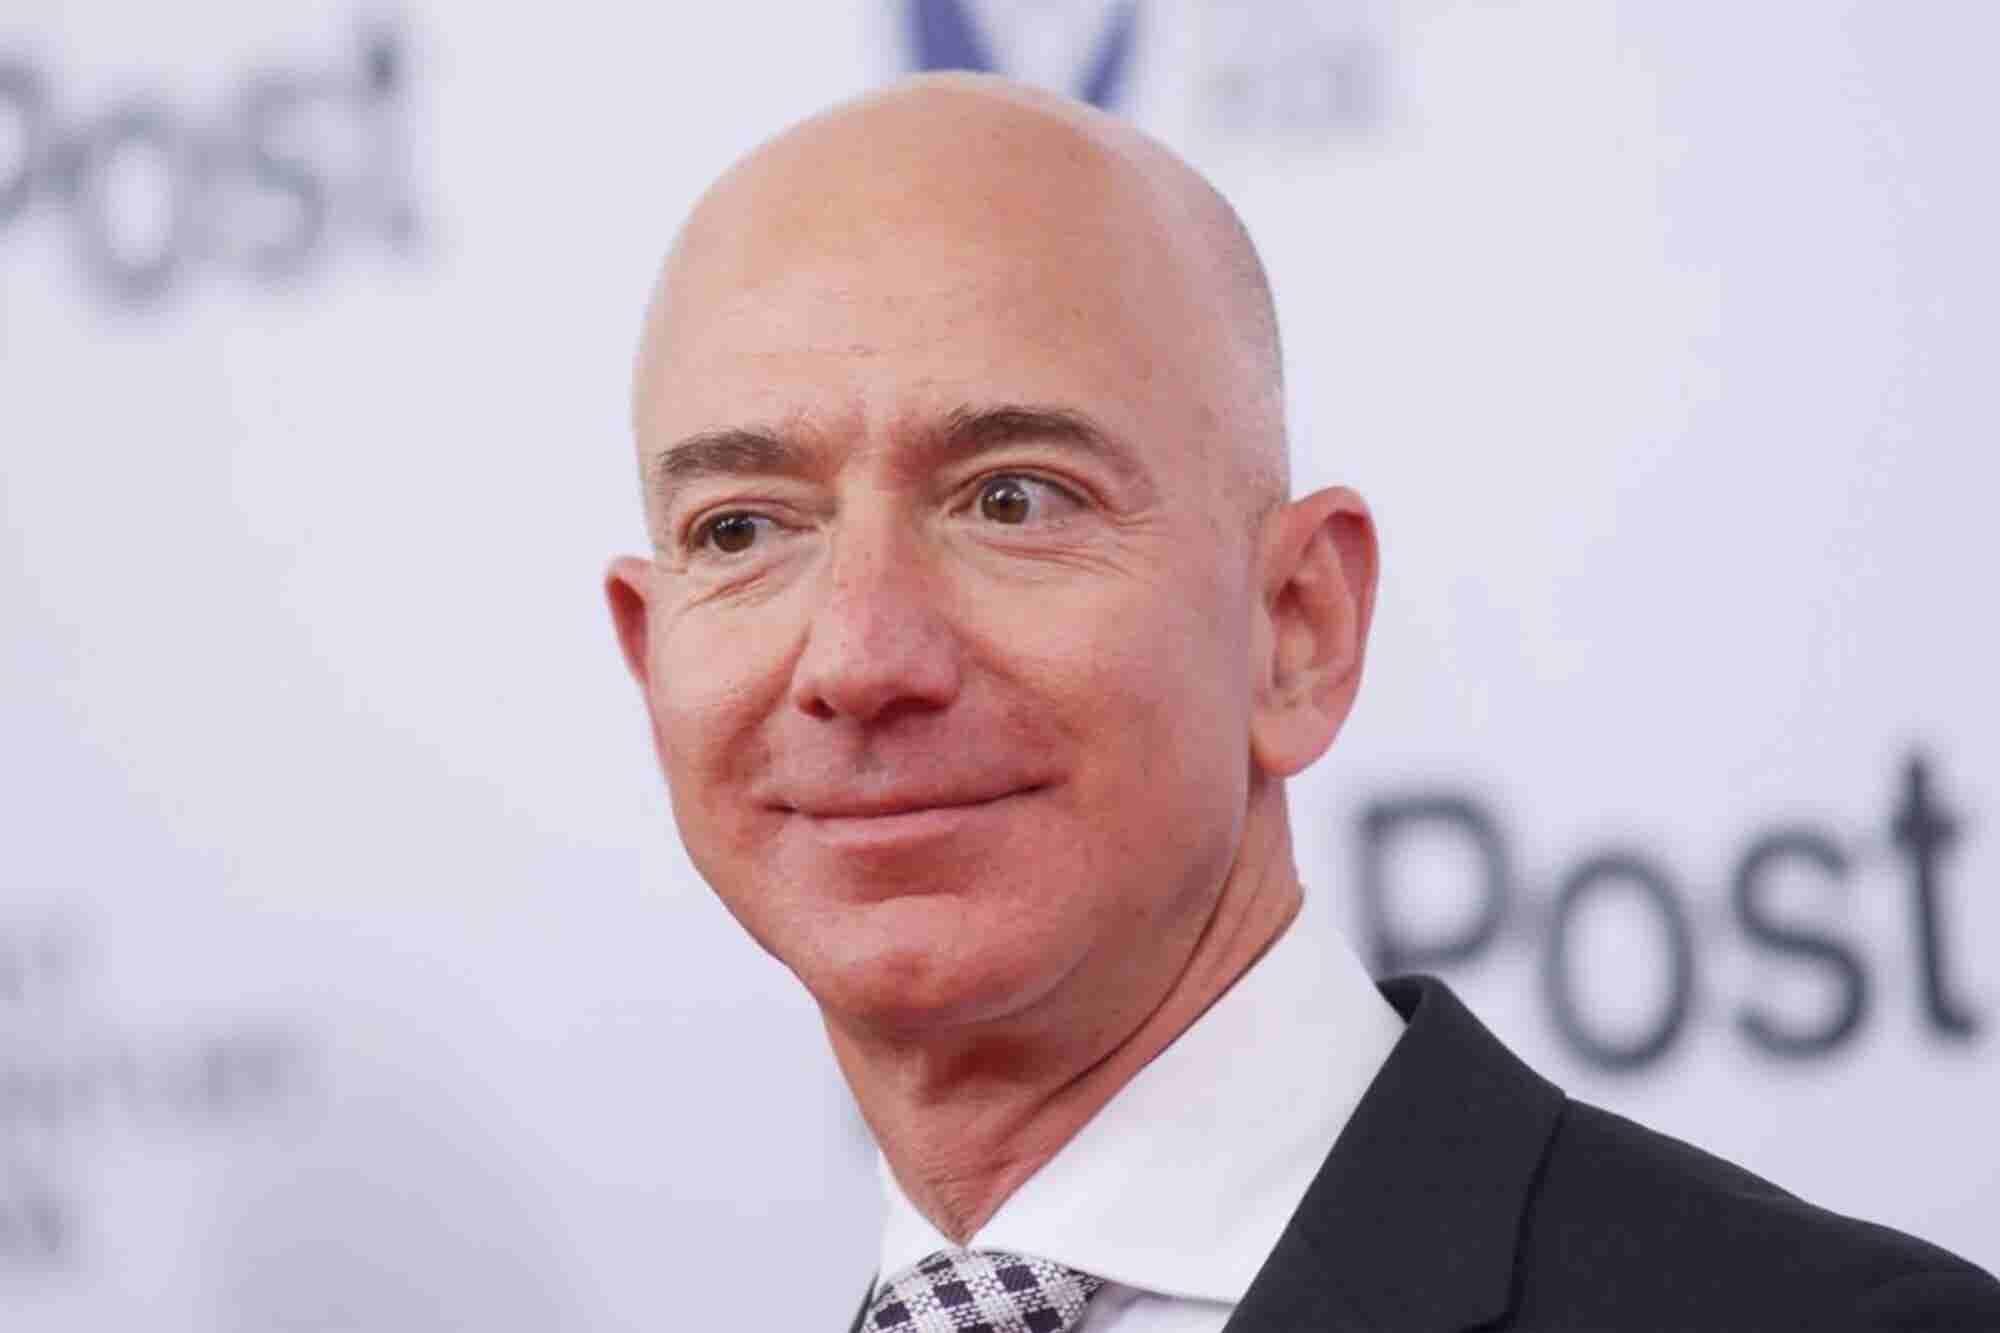 Jeff Bezos' Most Outrageous Business Failures